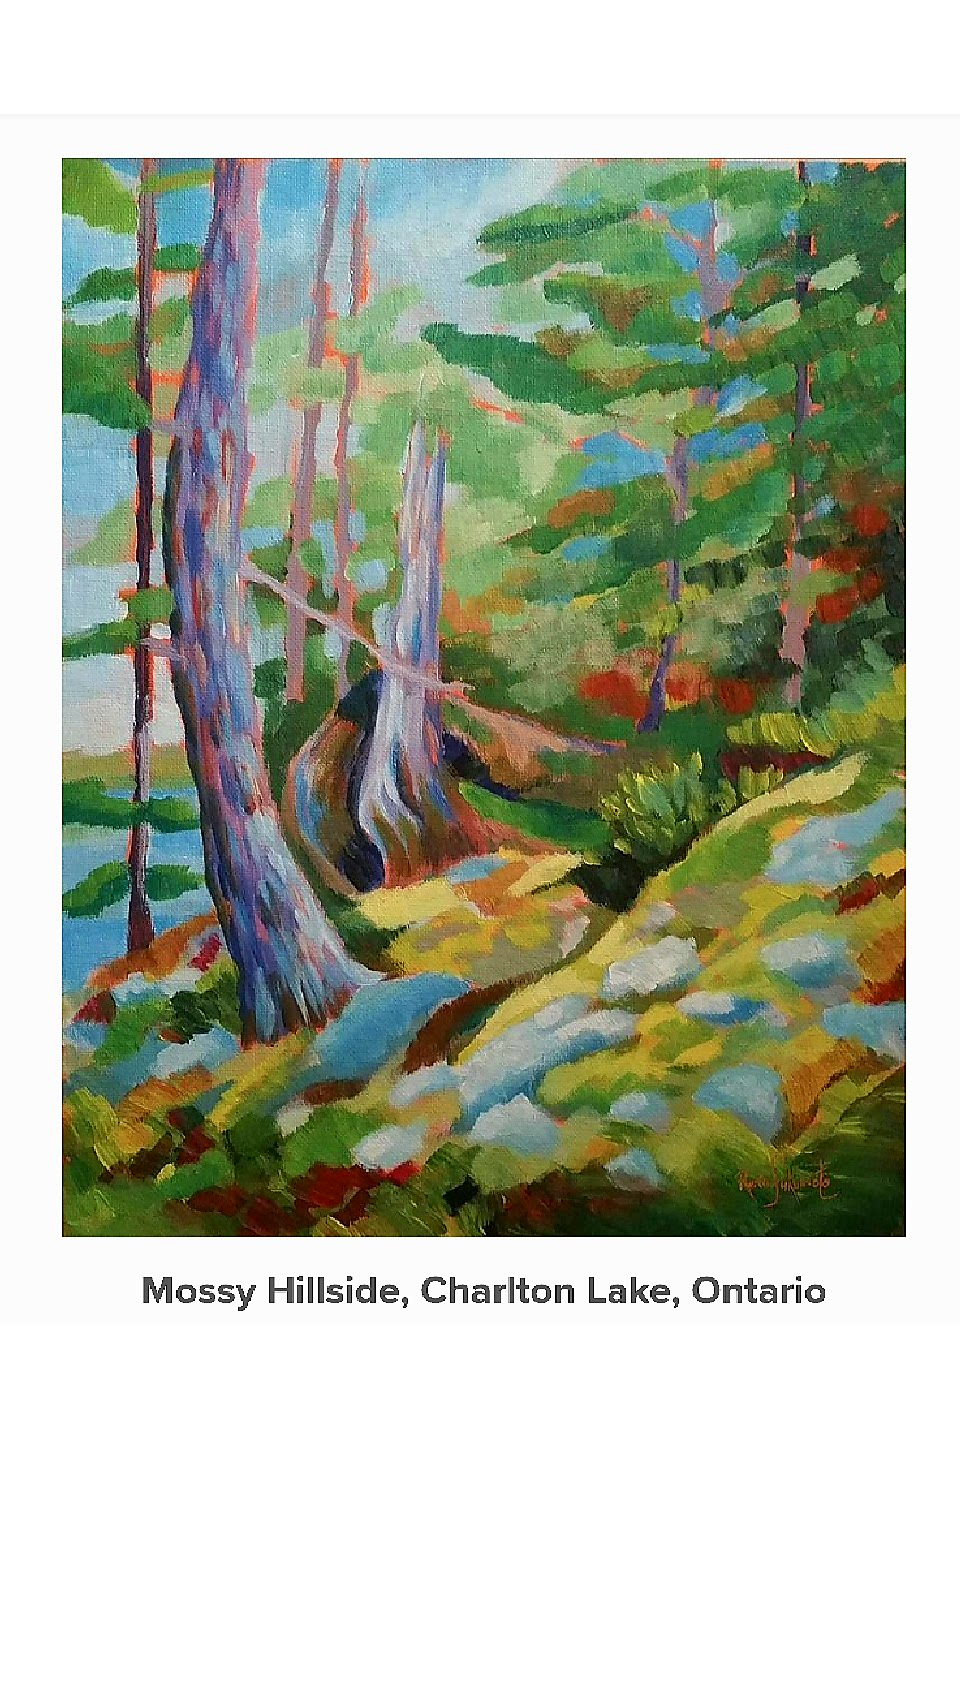 Cool-Mossy-Hillside-charlton-Lake-Ontario-copyright-Renee-Forth-Fukumoto-fine-artist.jpg